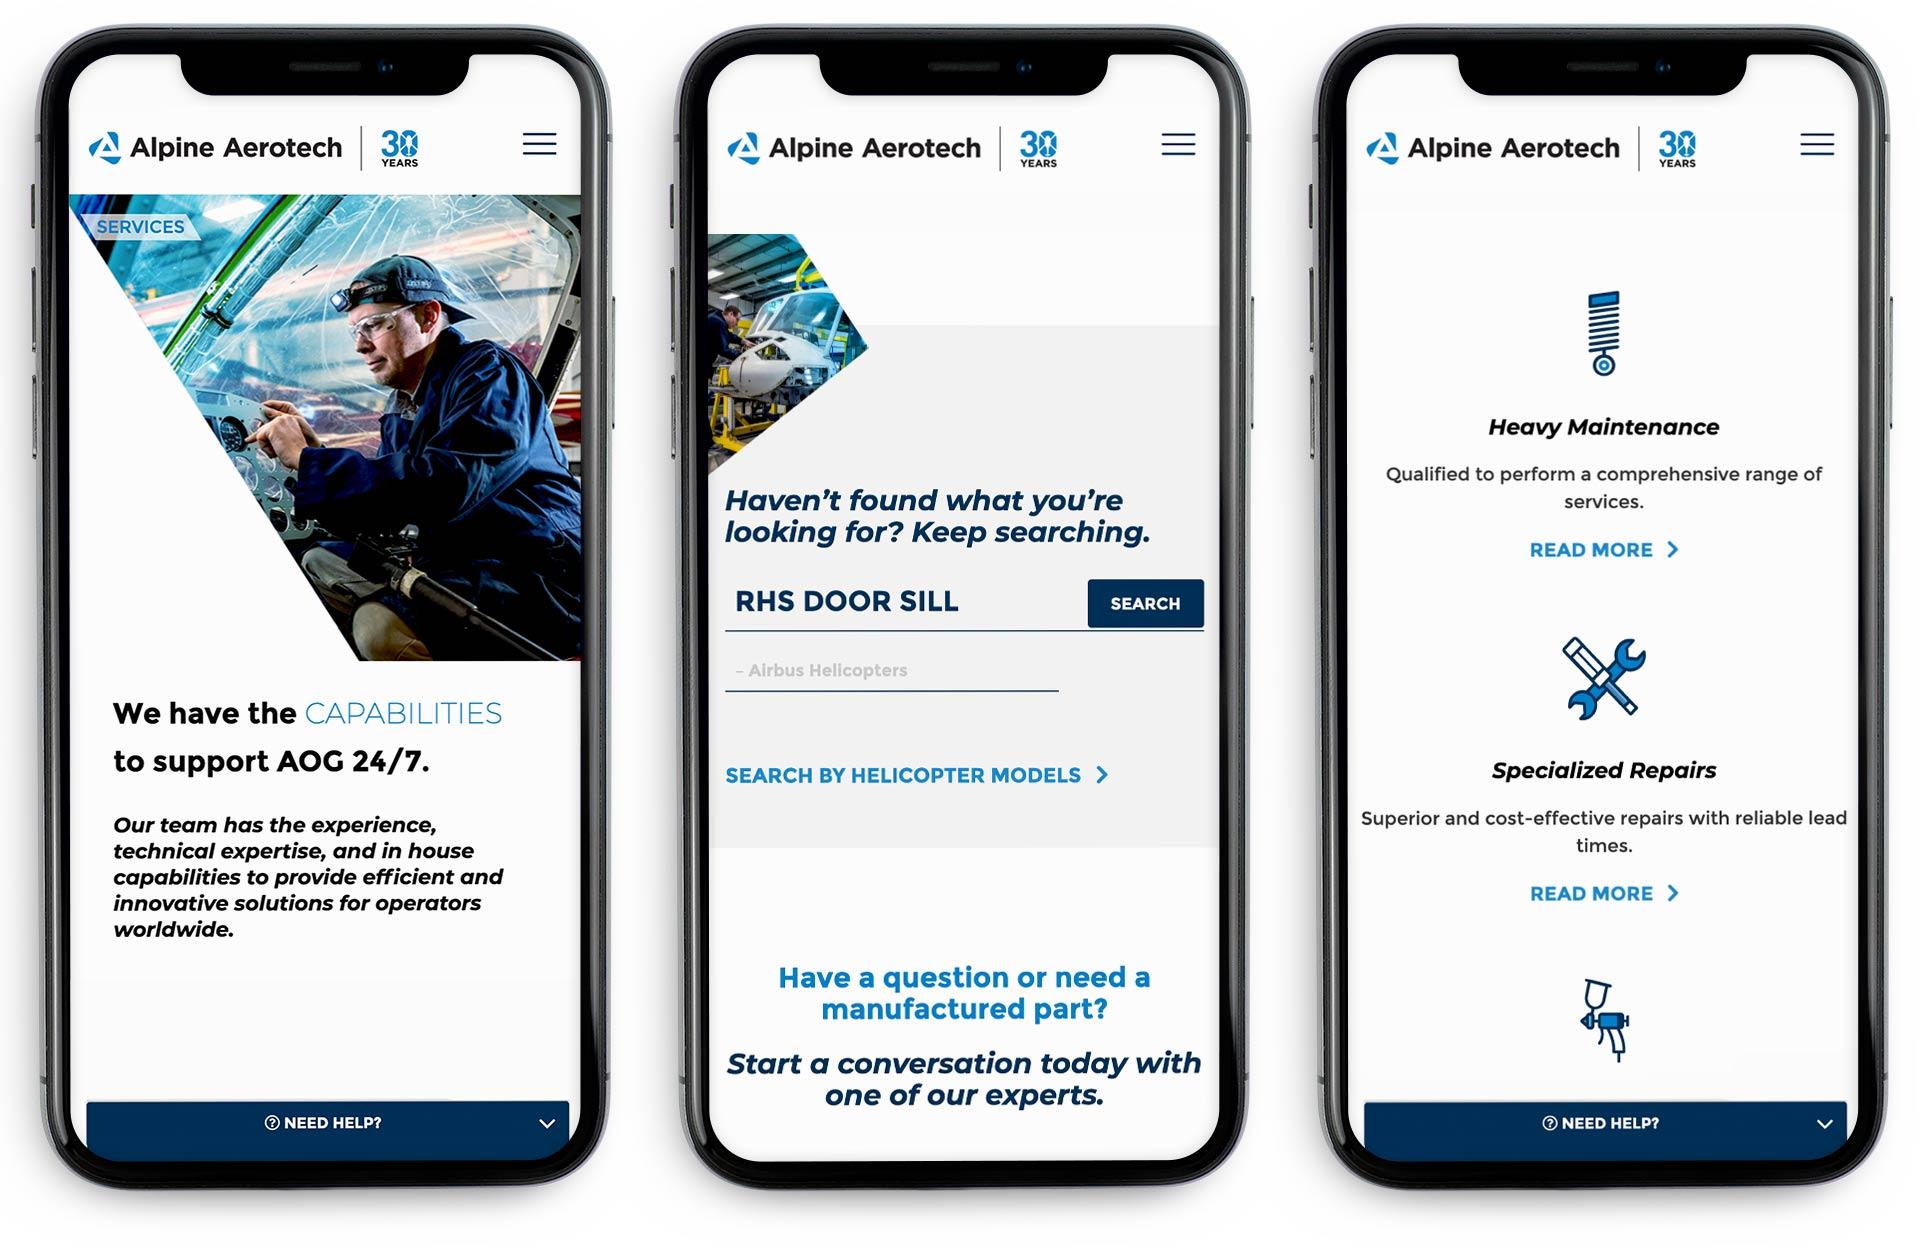 Alpine Aerotech Website Mockup on iPhones